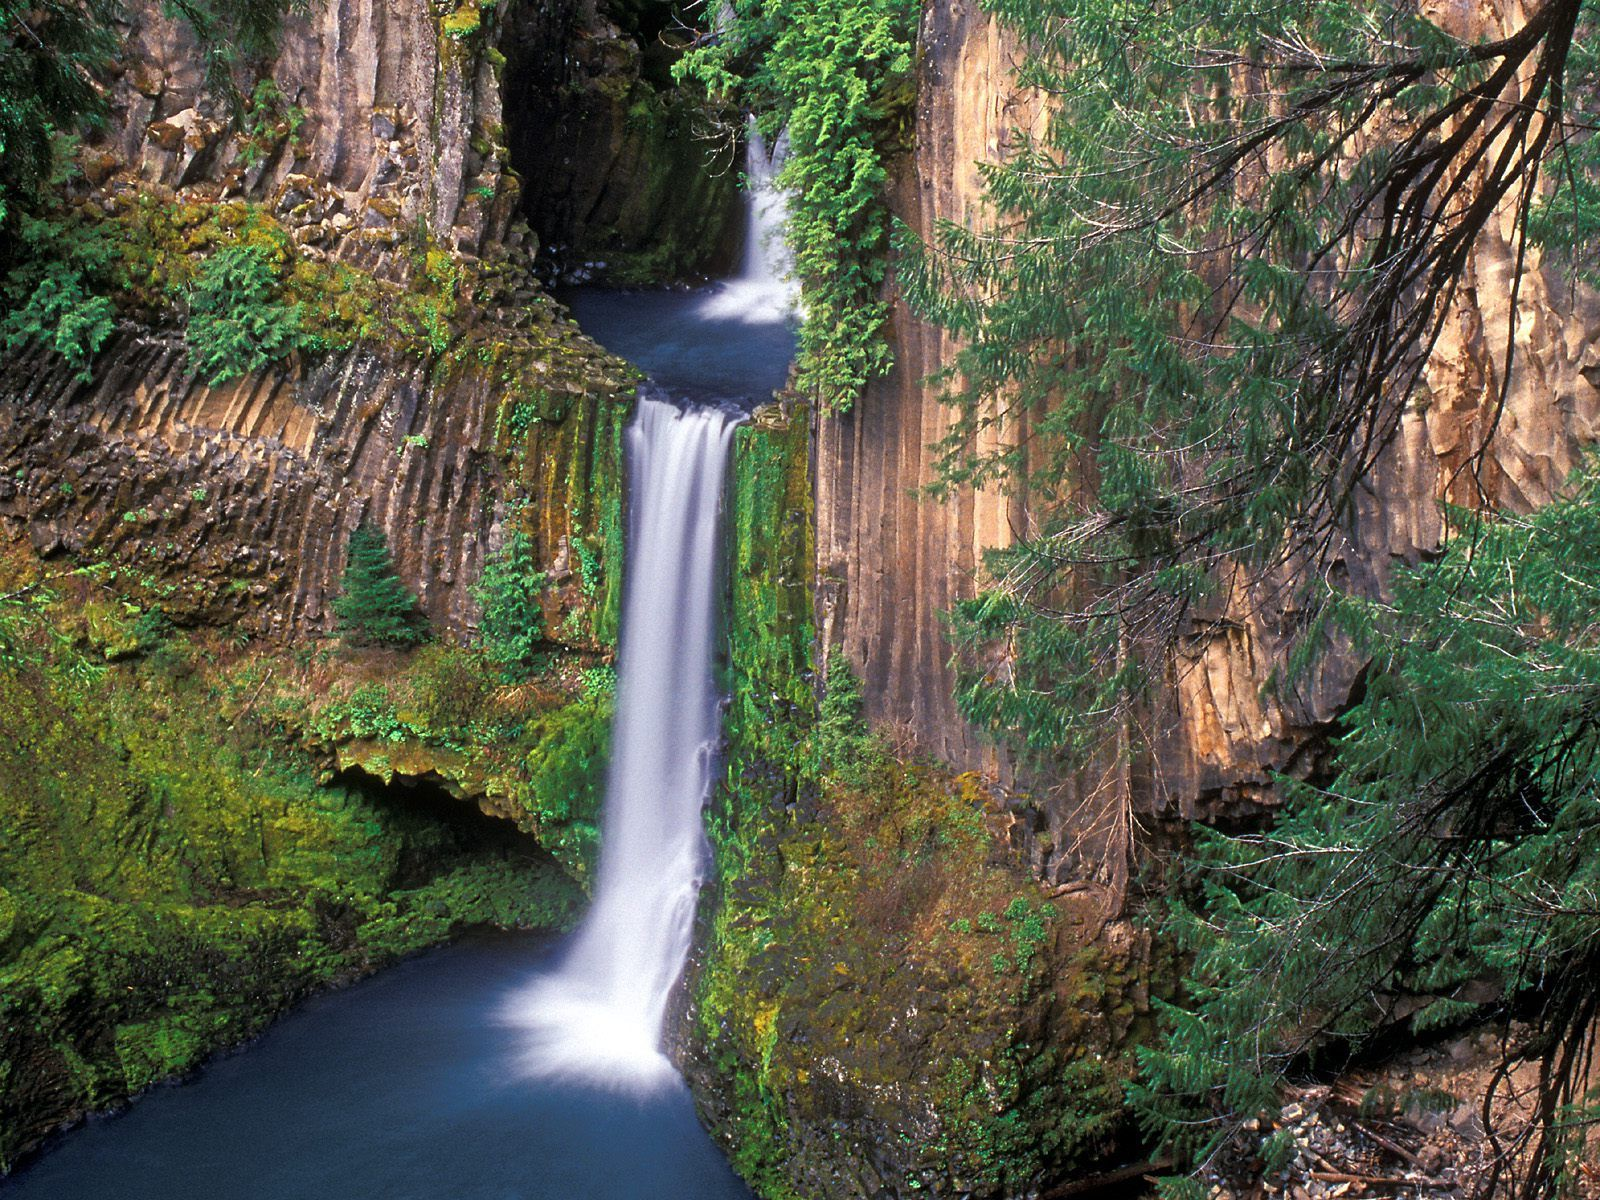 Hd Wallpapers 1600x1200 187 Nature 187 Toketee Falls Oregon